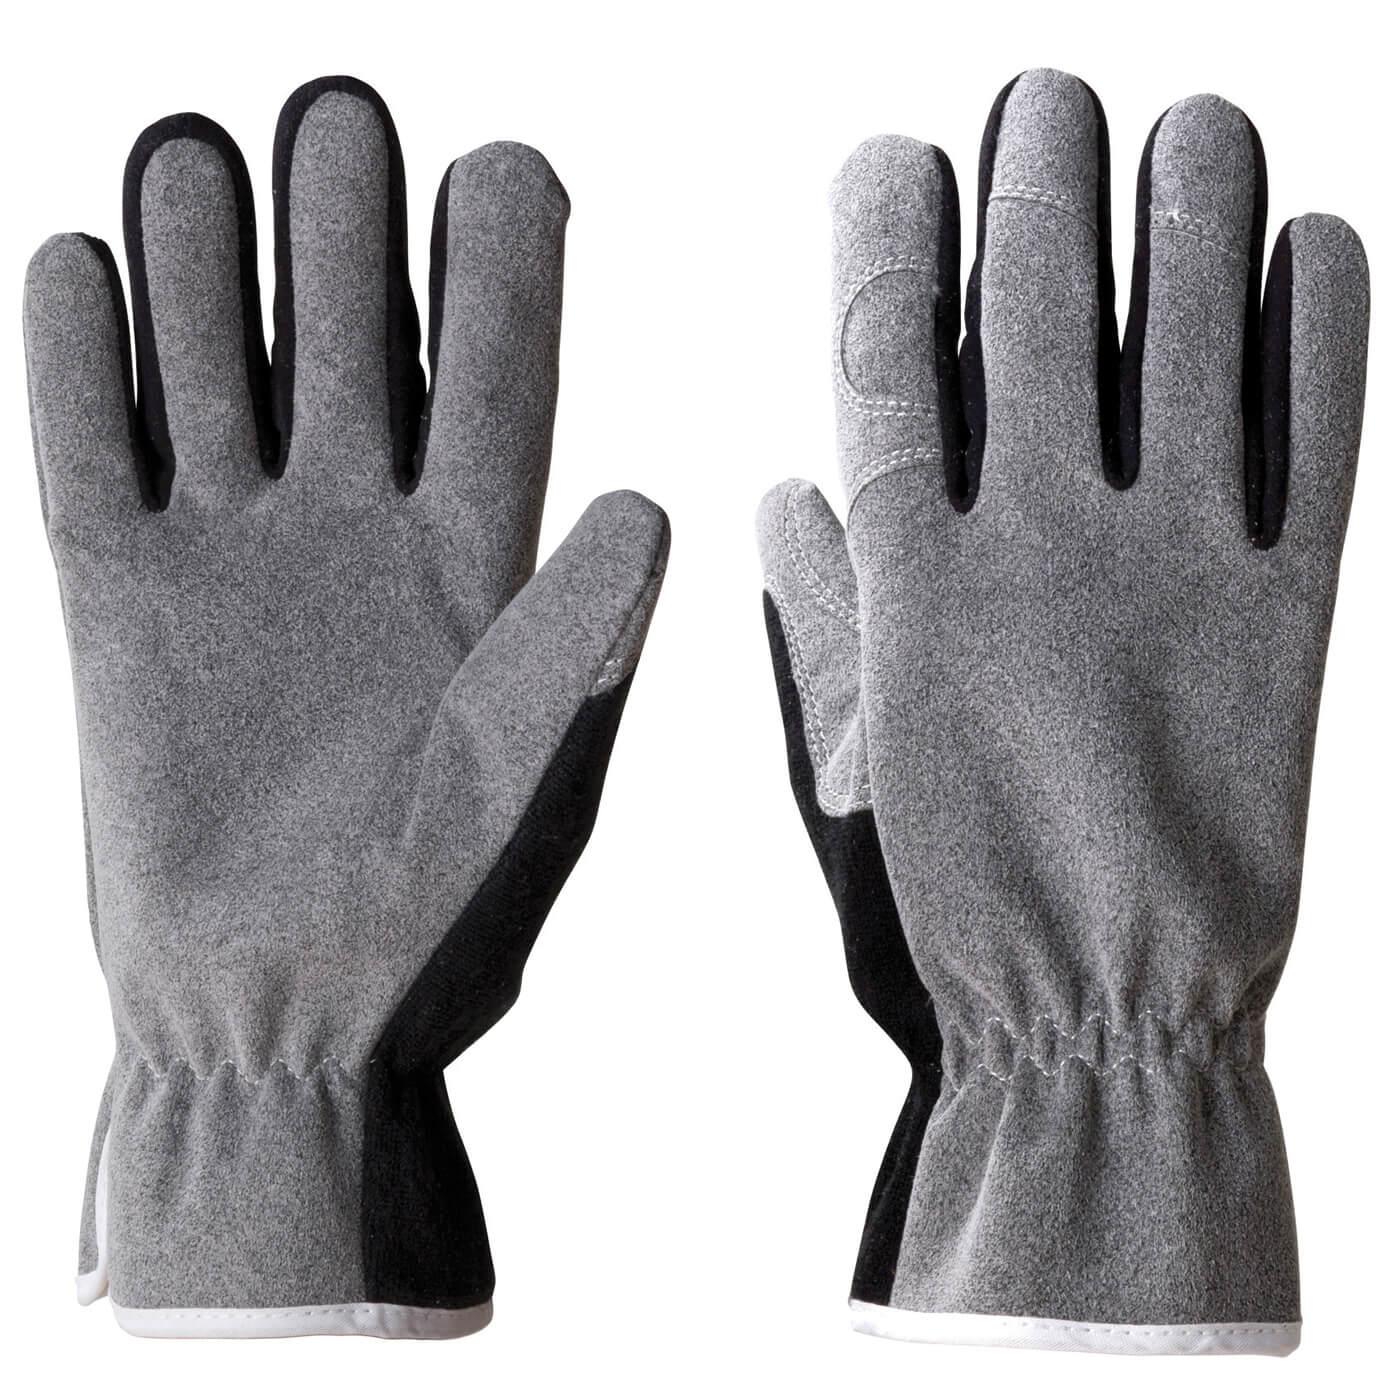 Rękawice zimowe KCL 644 REWOCOLD